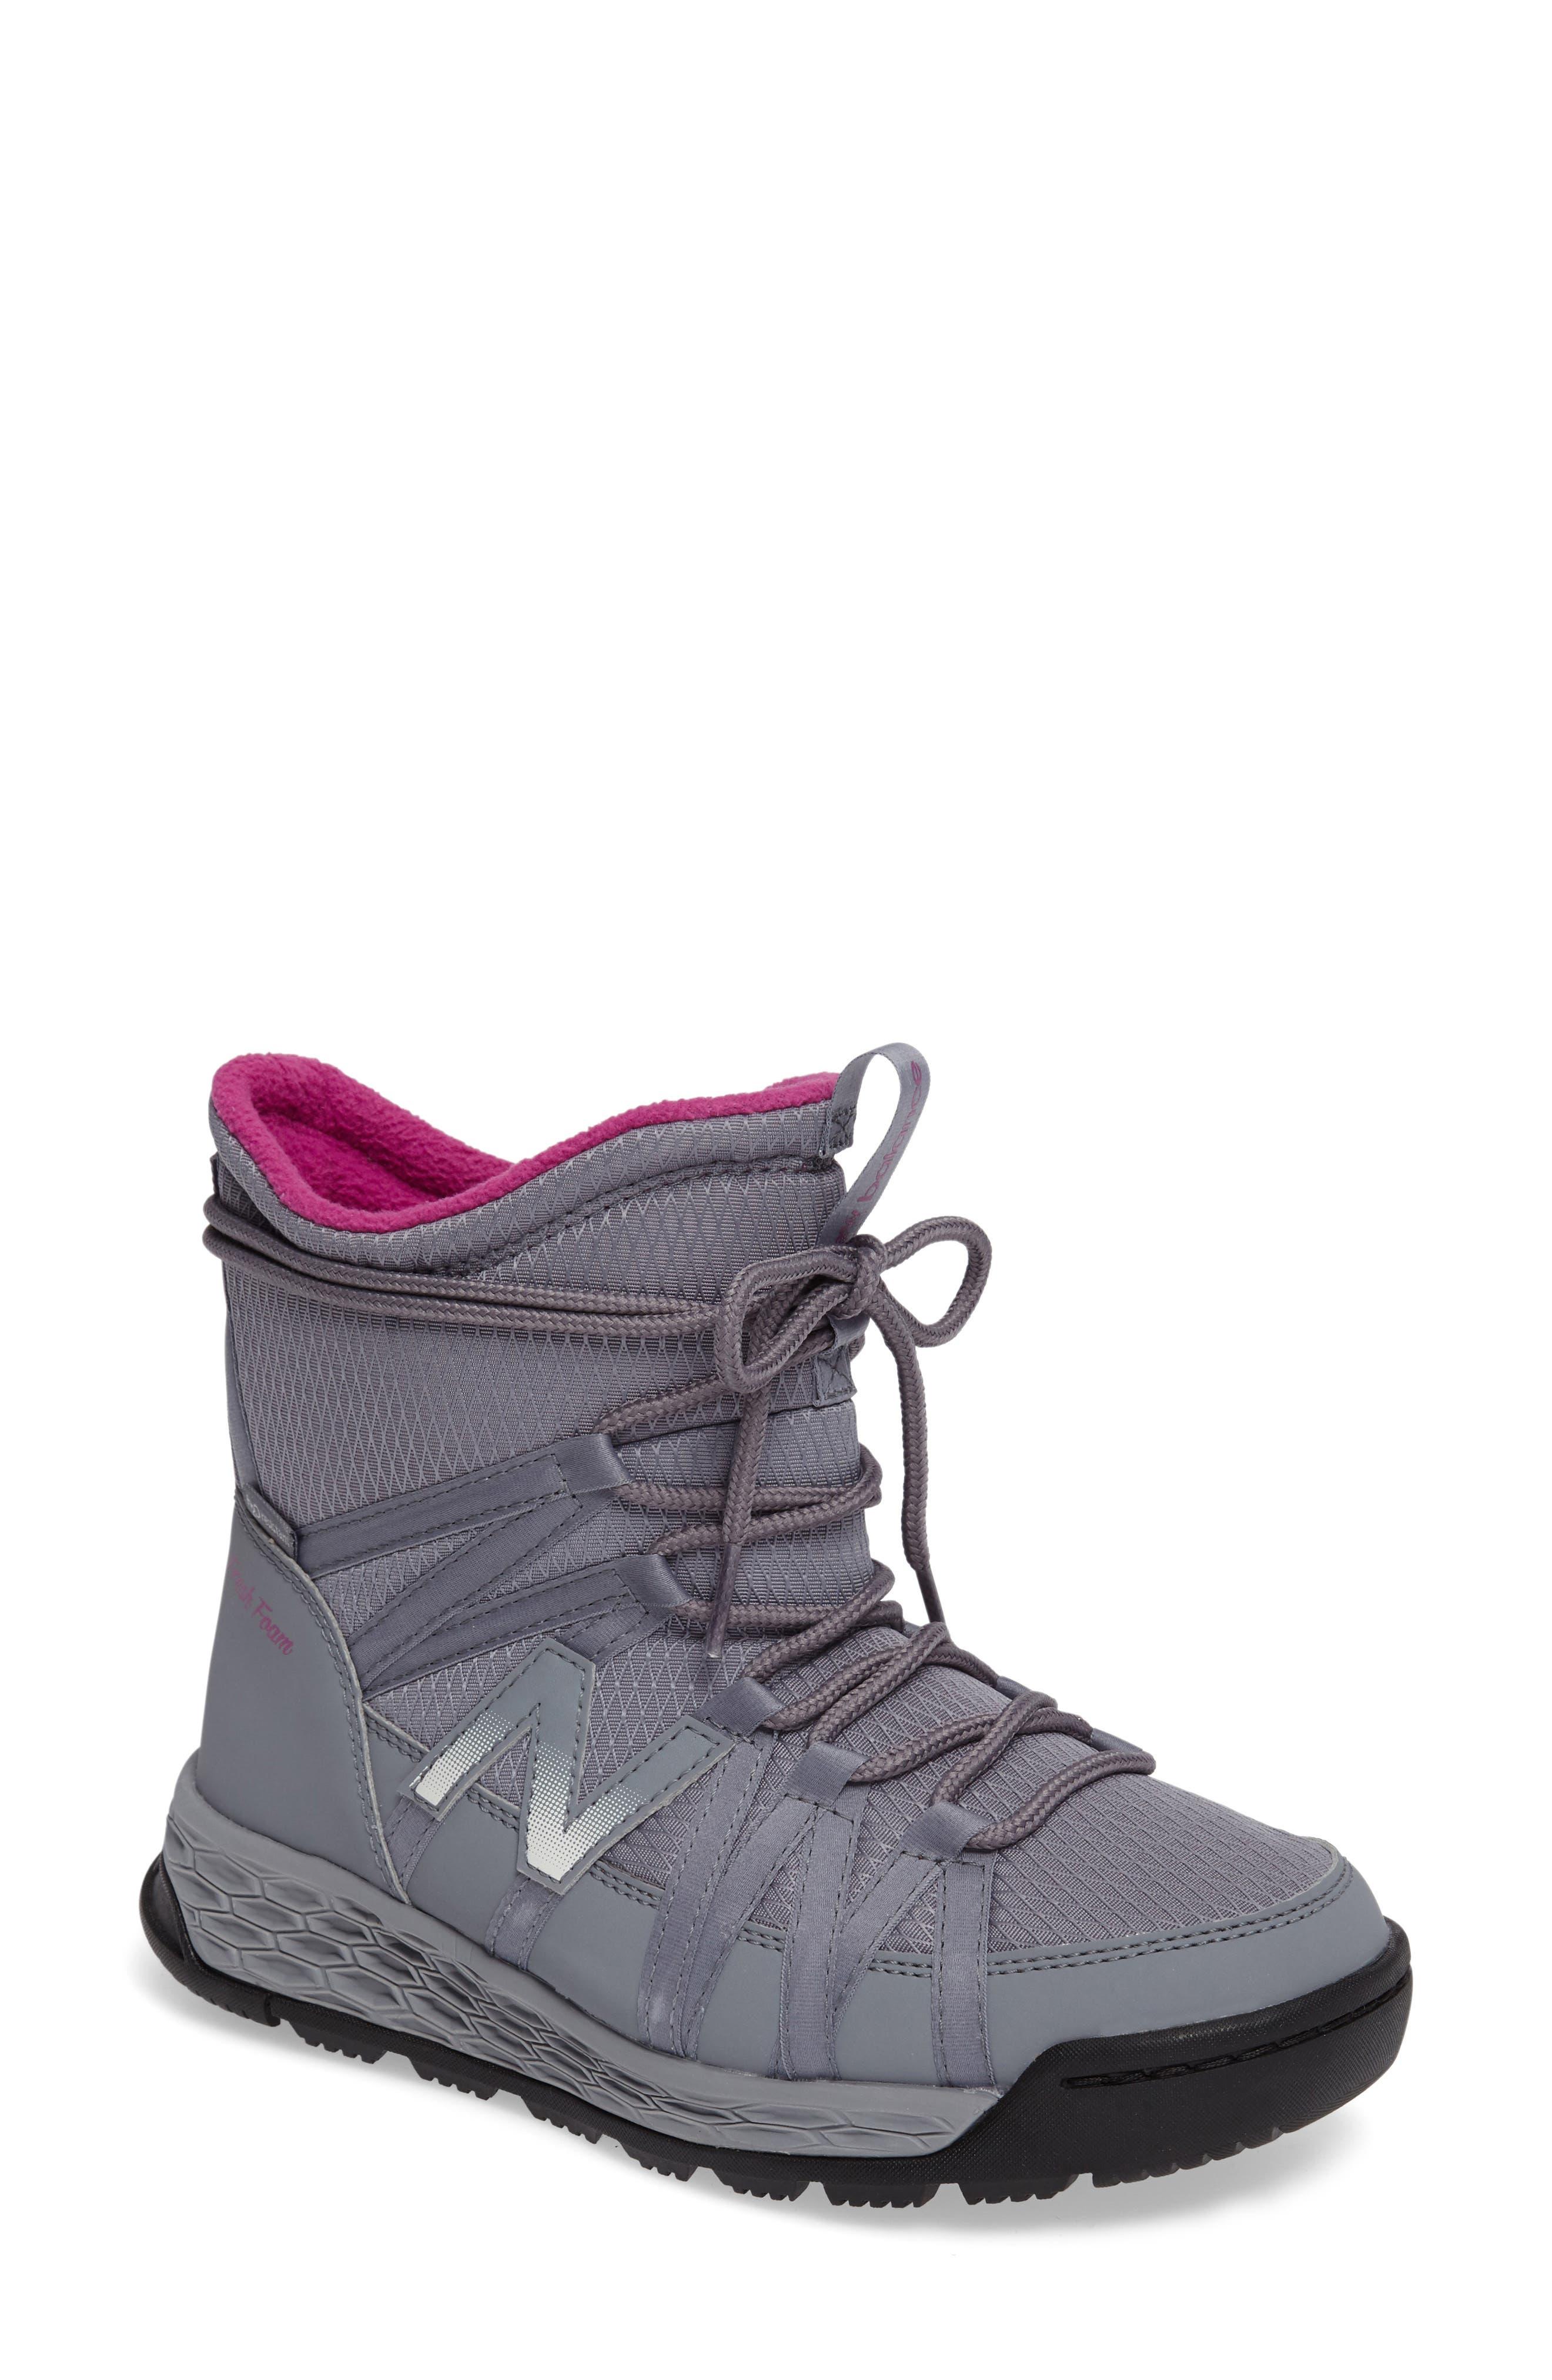 Q416 Weatherproof Snow Boot,                             Alternate thumbnail 5, color,